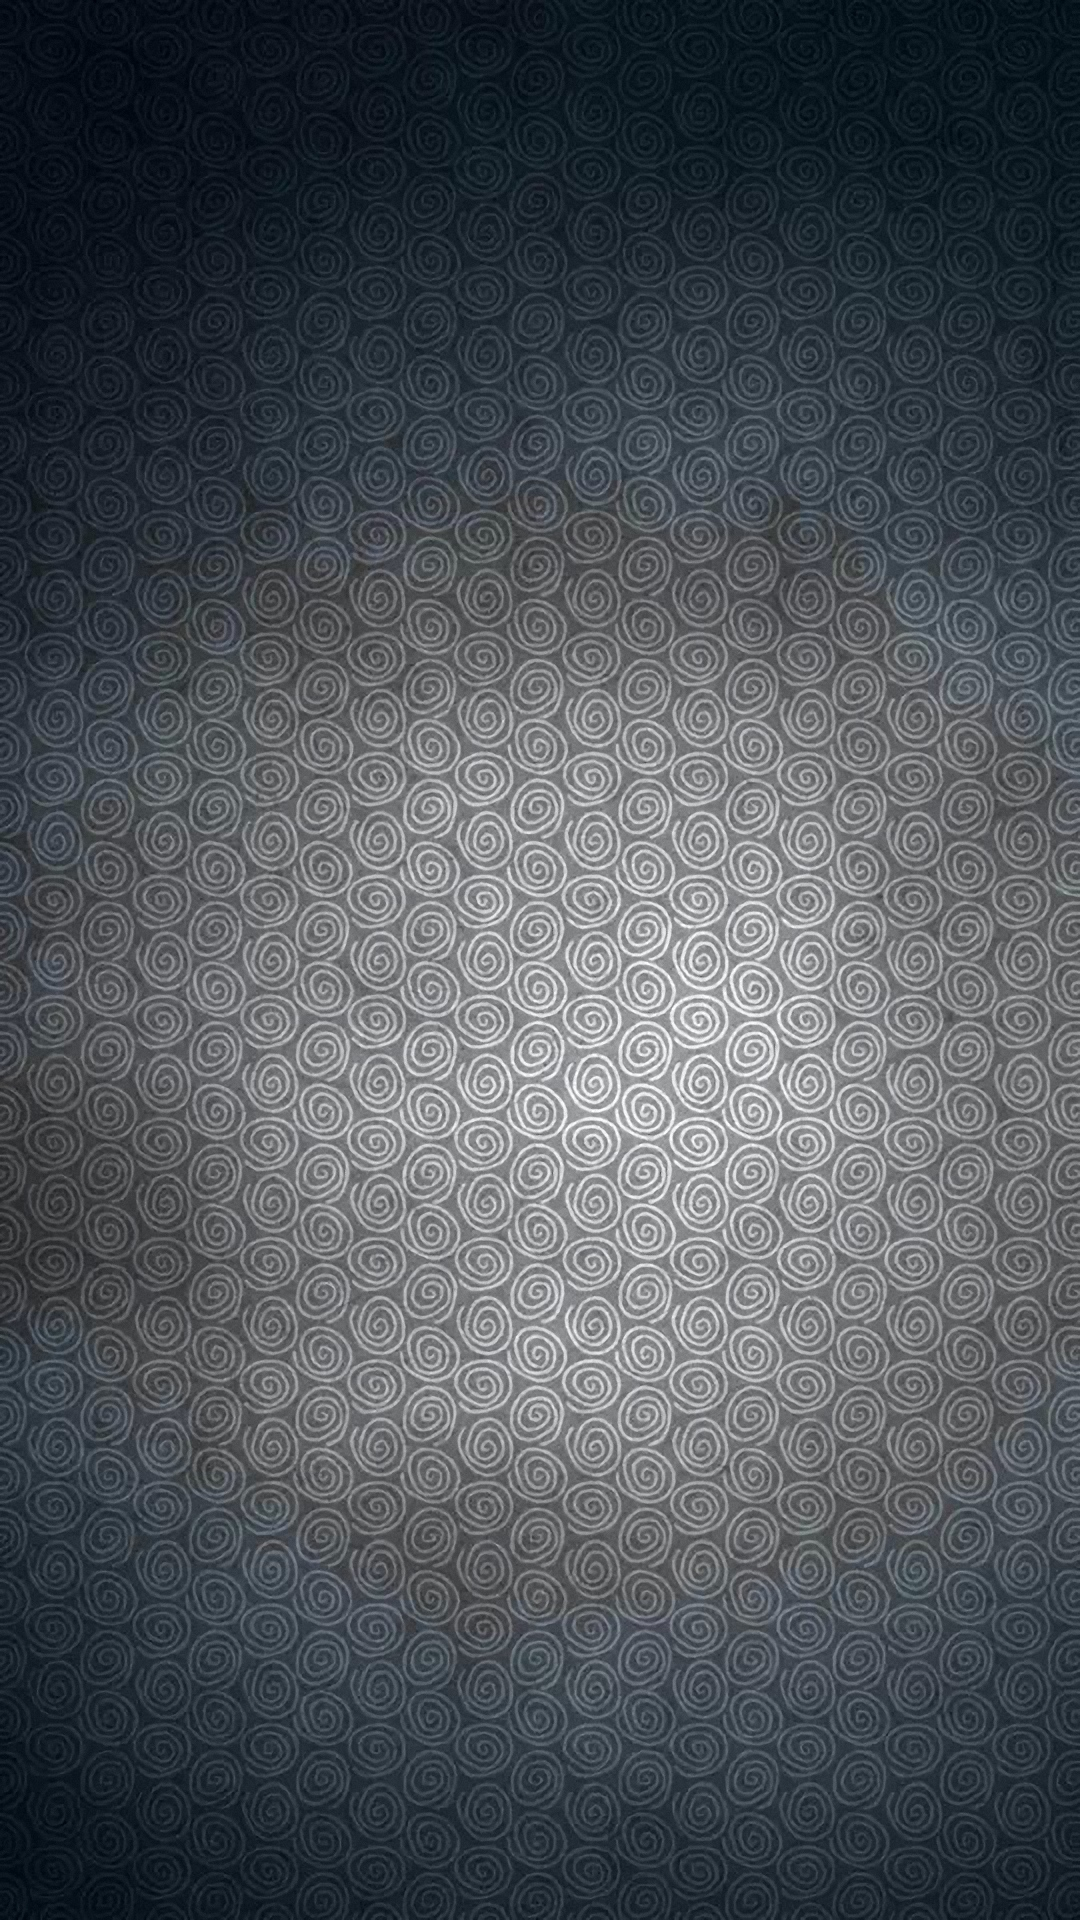 HD 1080x1920 dark pattern nokia phone wallpapers 1080x1920